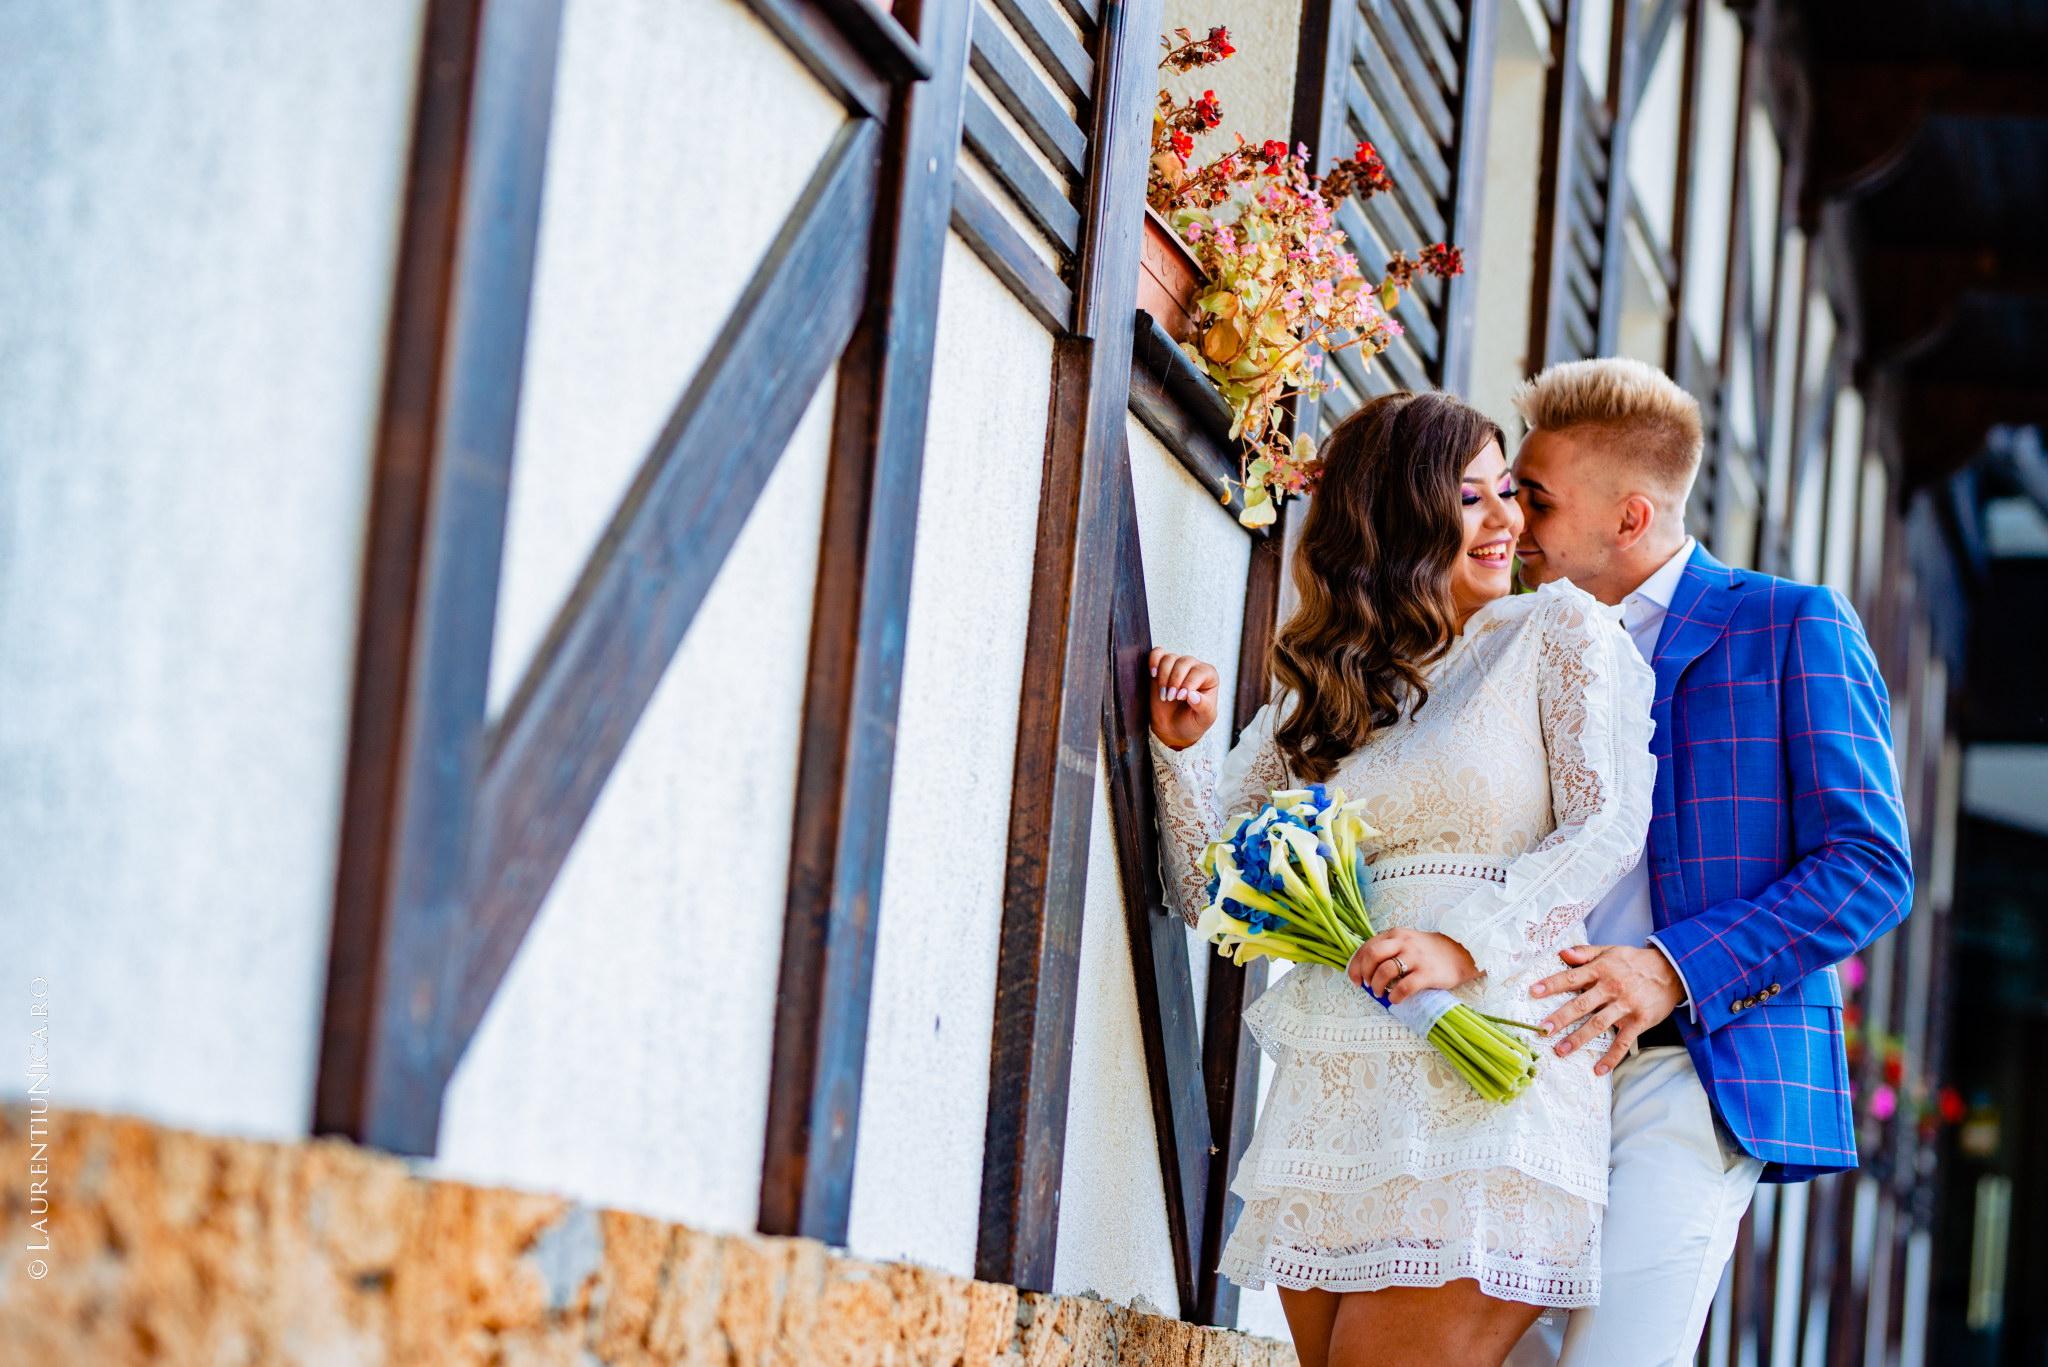 fotografii nunta Roxana si Cosmin fotograf nunta laurentiu nica 05 - Roxana & Cosmin | Fotografii nunta | Ticleni, judetul Gorj